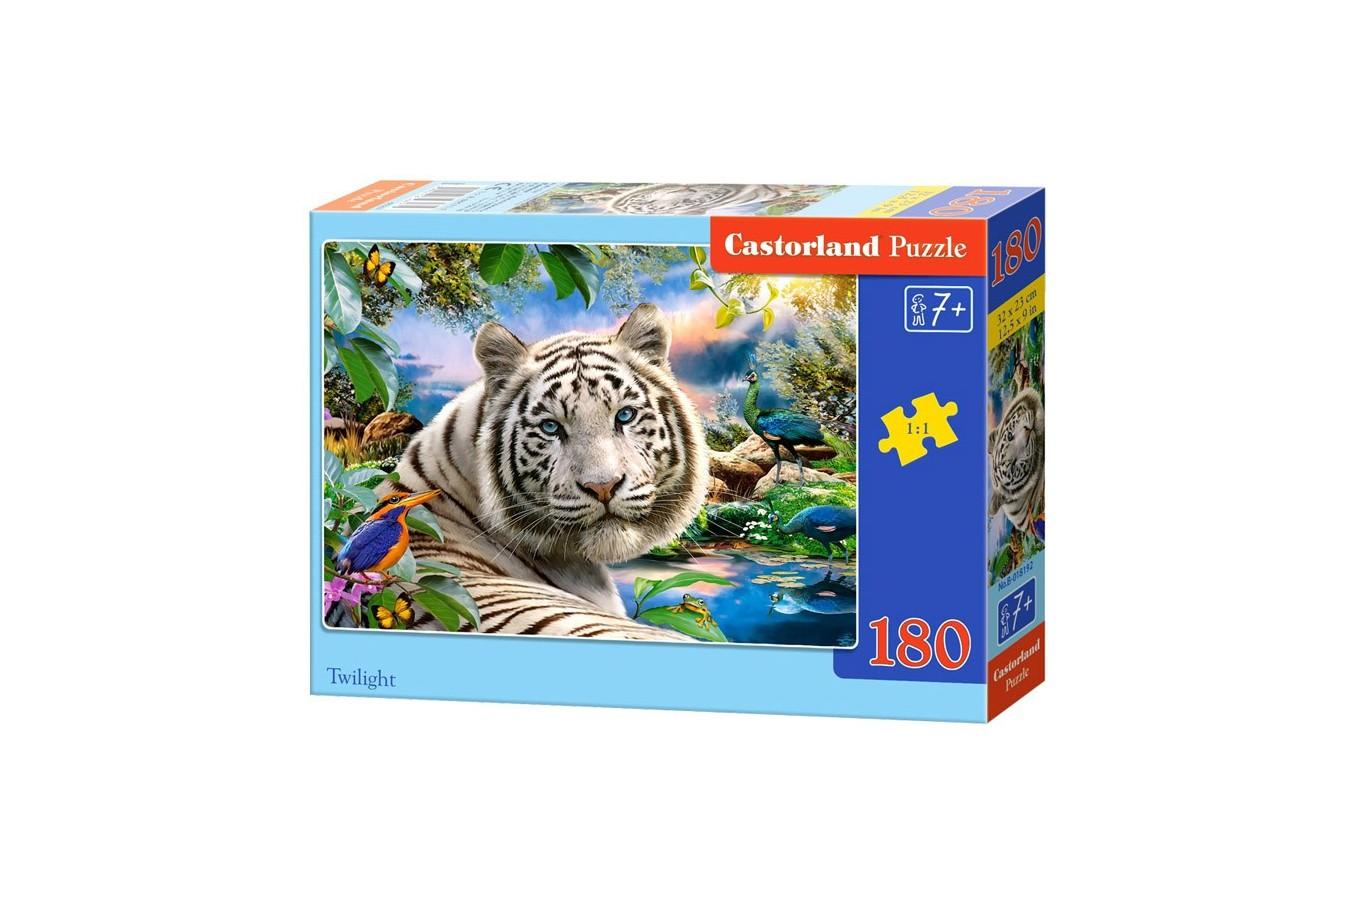 Puzzle Castorland - Twilight, 180 Piese